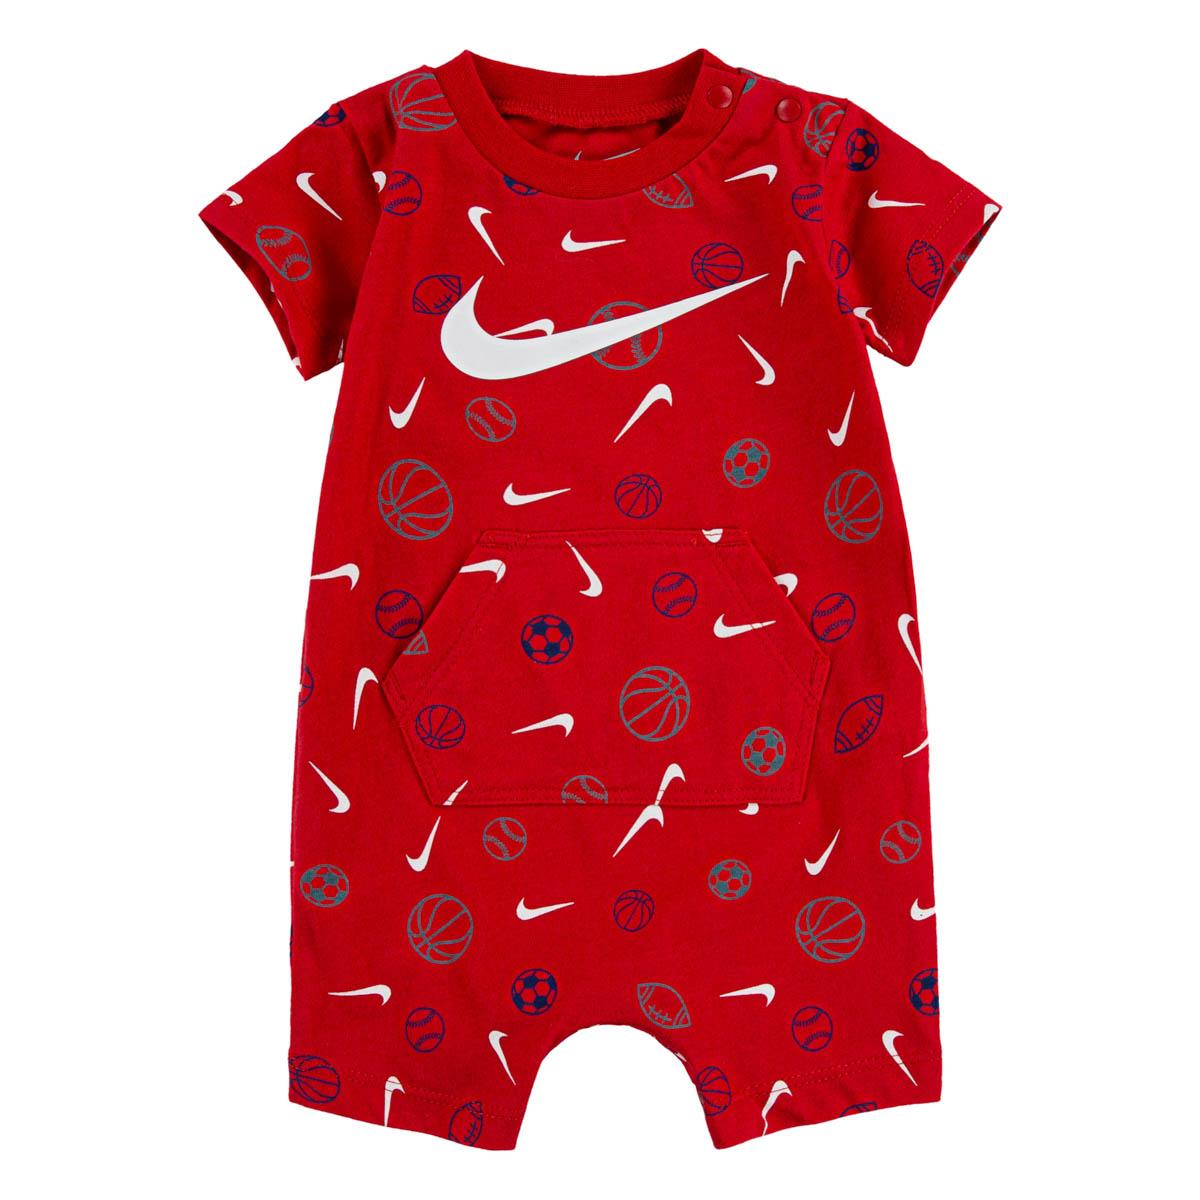 Nike Printed Romper Body